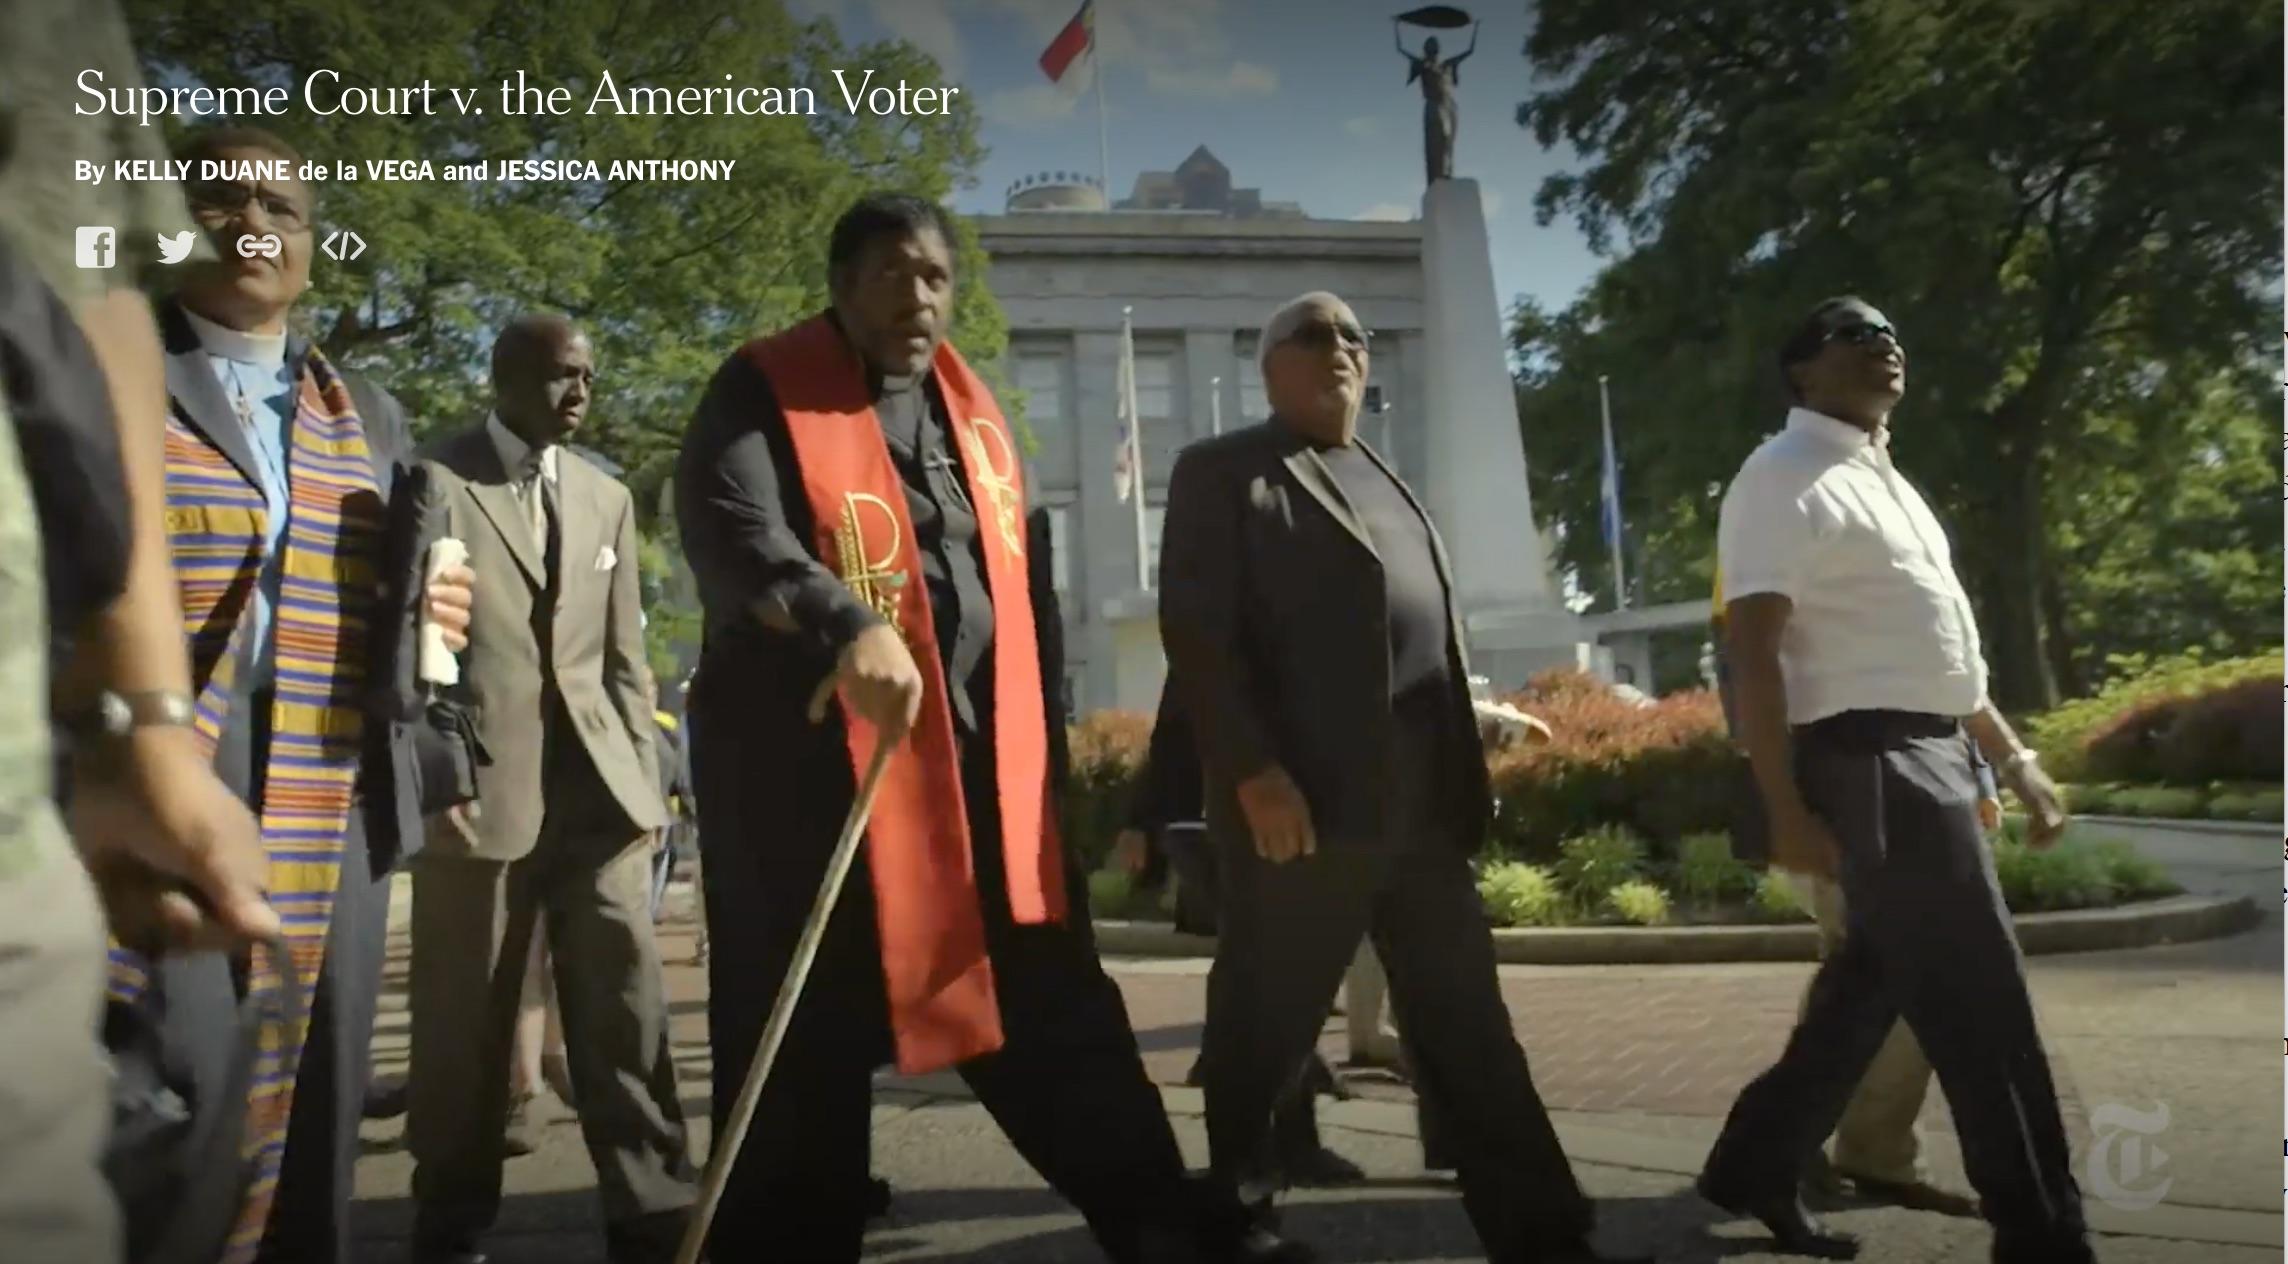 Supreme Court v. the American Voter